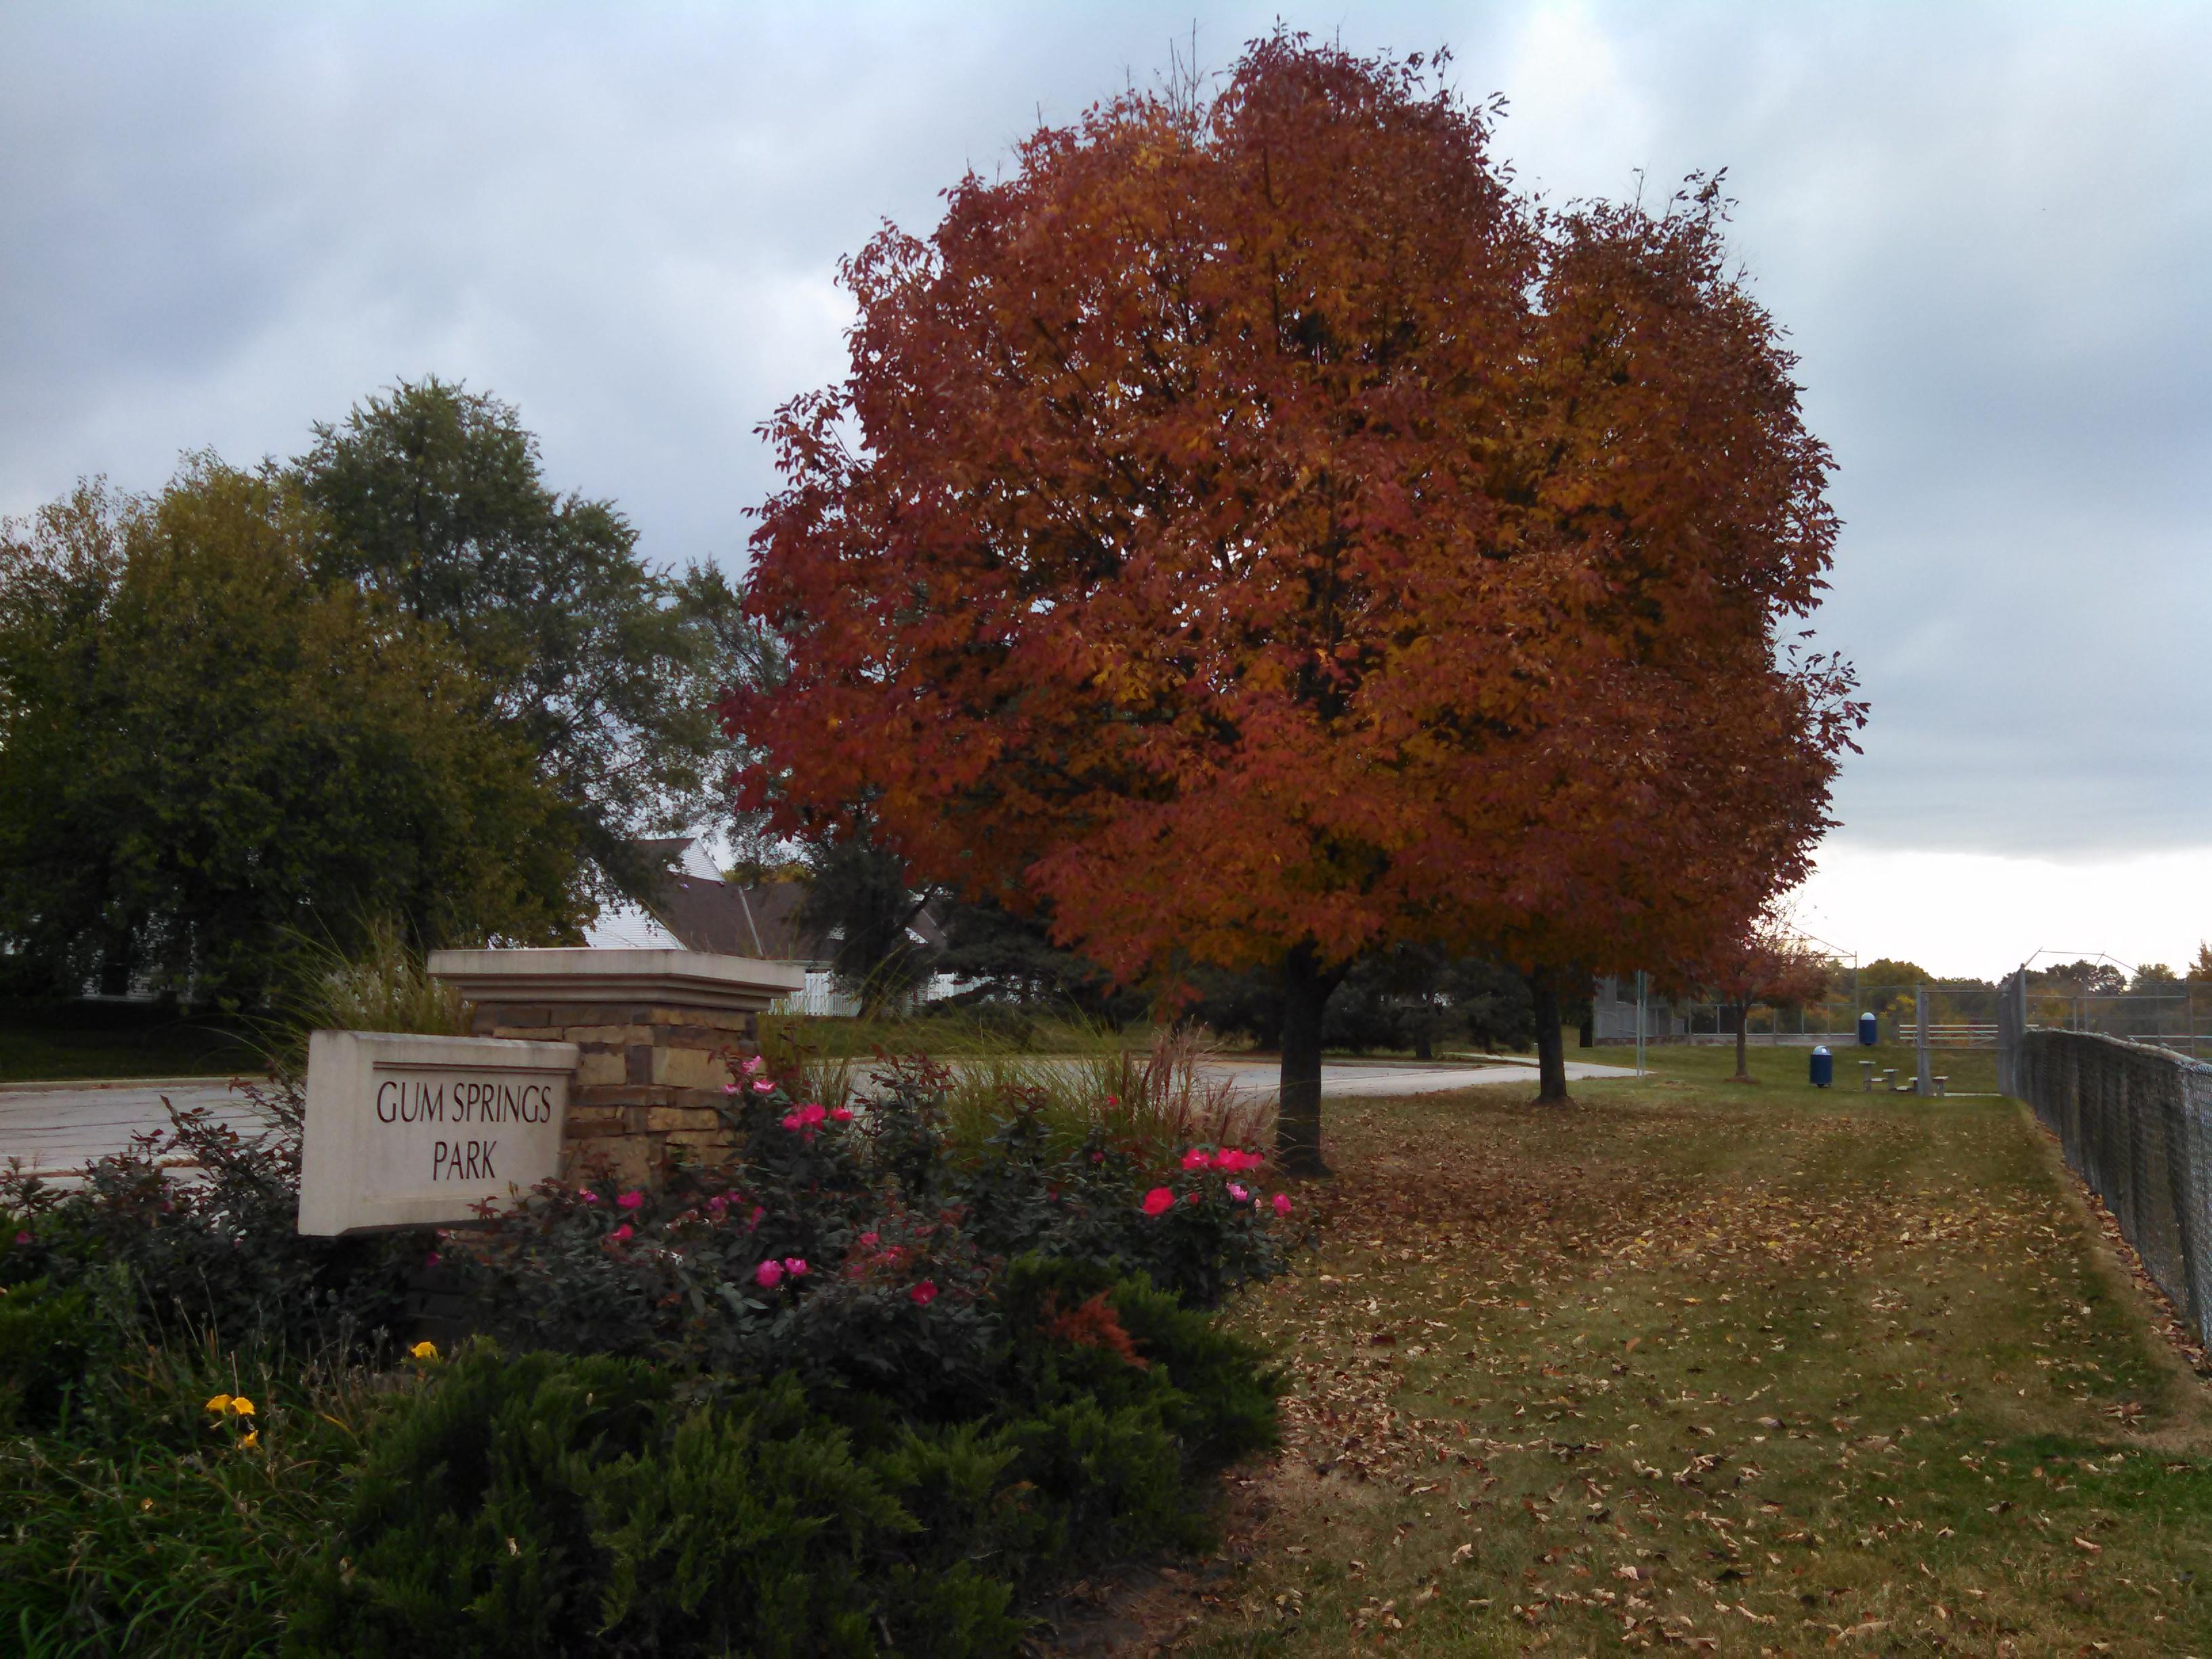 Gum Springs Park | Get Outdoors Kansas